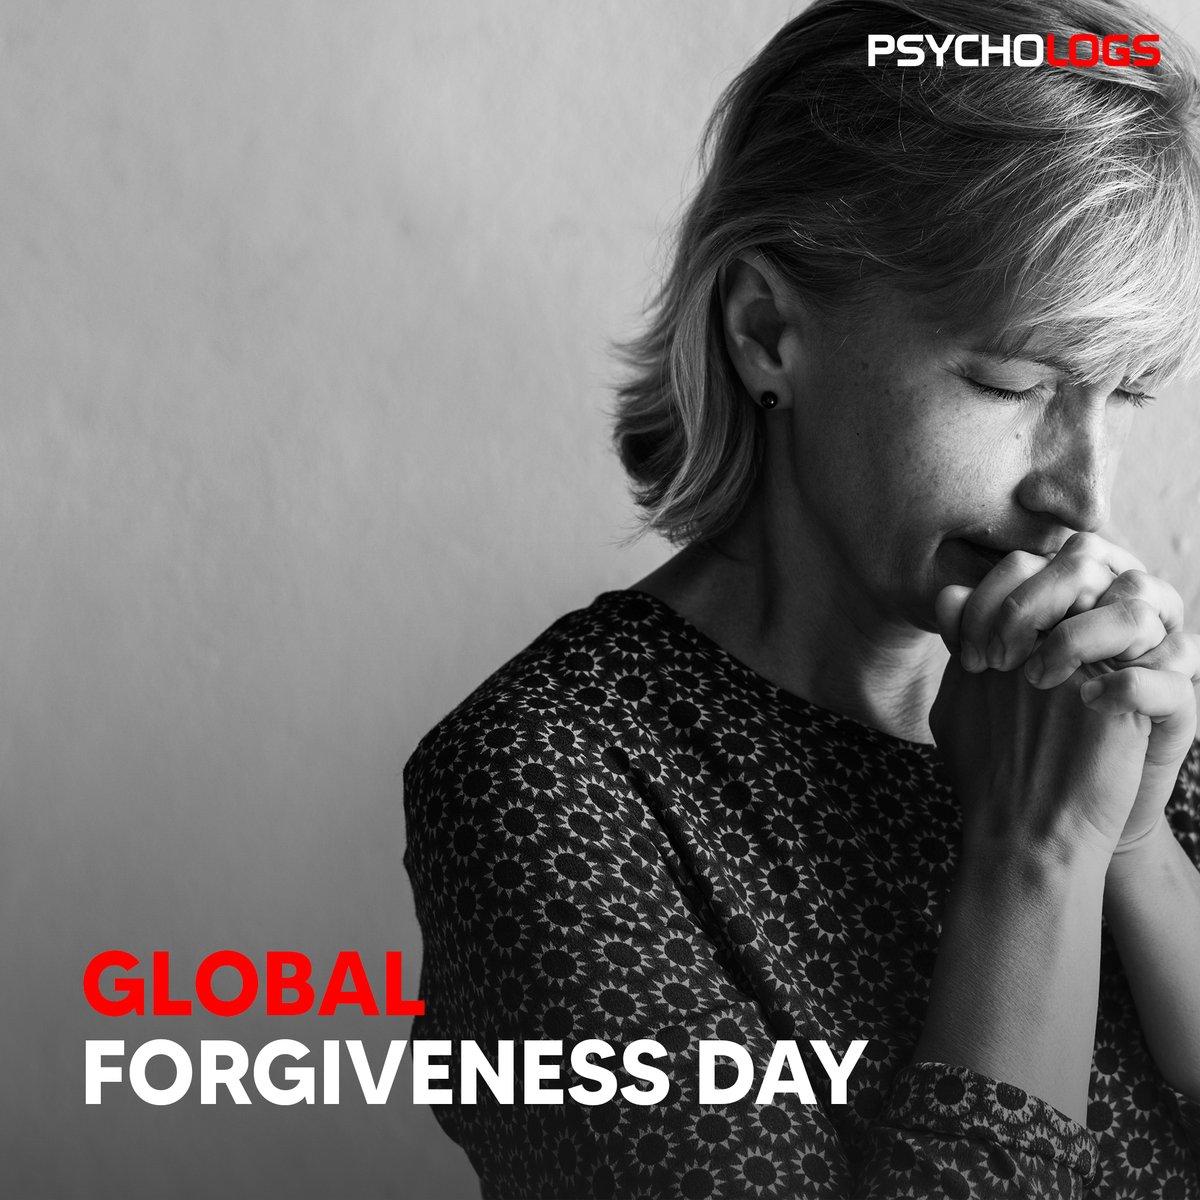 Global Forgiveness Day  #forgiveness #peace #spirituality #life #faith #soul #hope #compassion #wisdom #believe #prayers #spiritual #mind #pray #meditation #calm #god #destiny #trust #faithful #grace #coexist #meditate #Psychologspic.twitter.com/JjeKDBiPdz